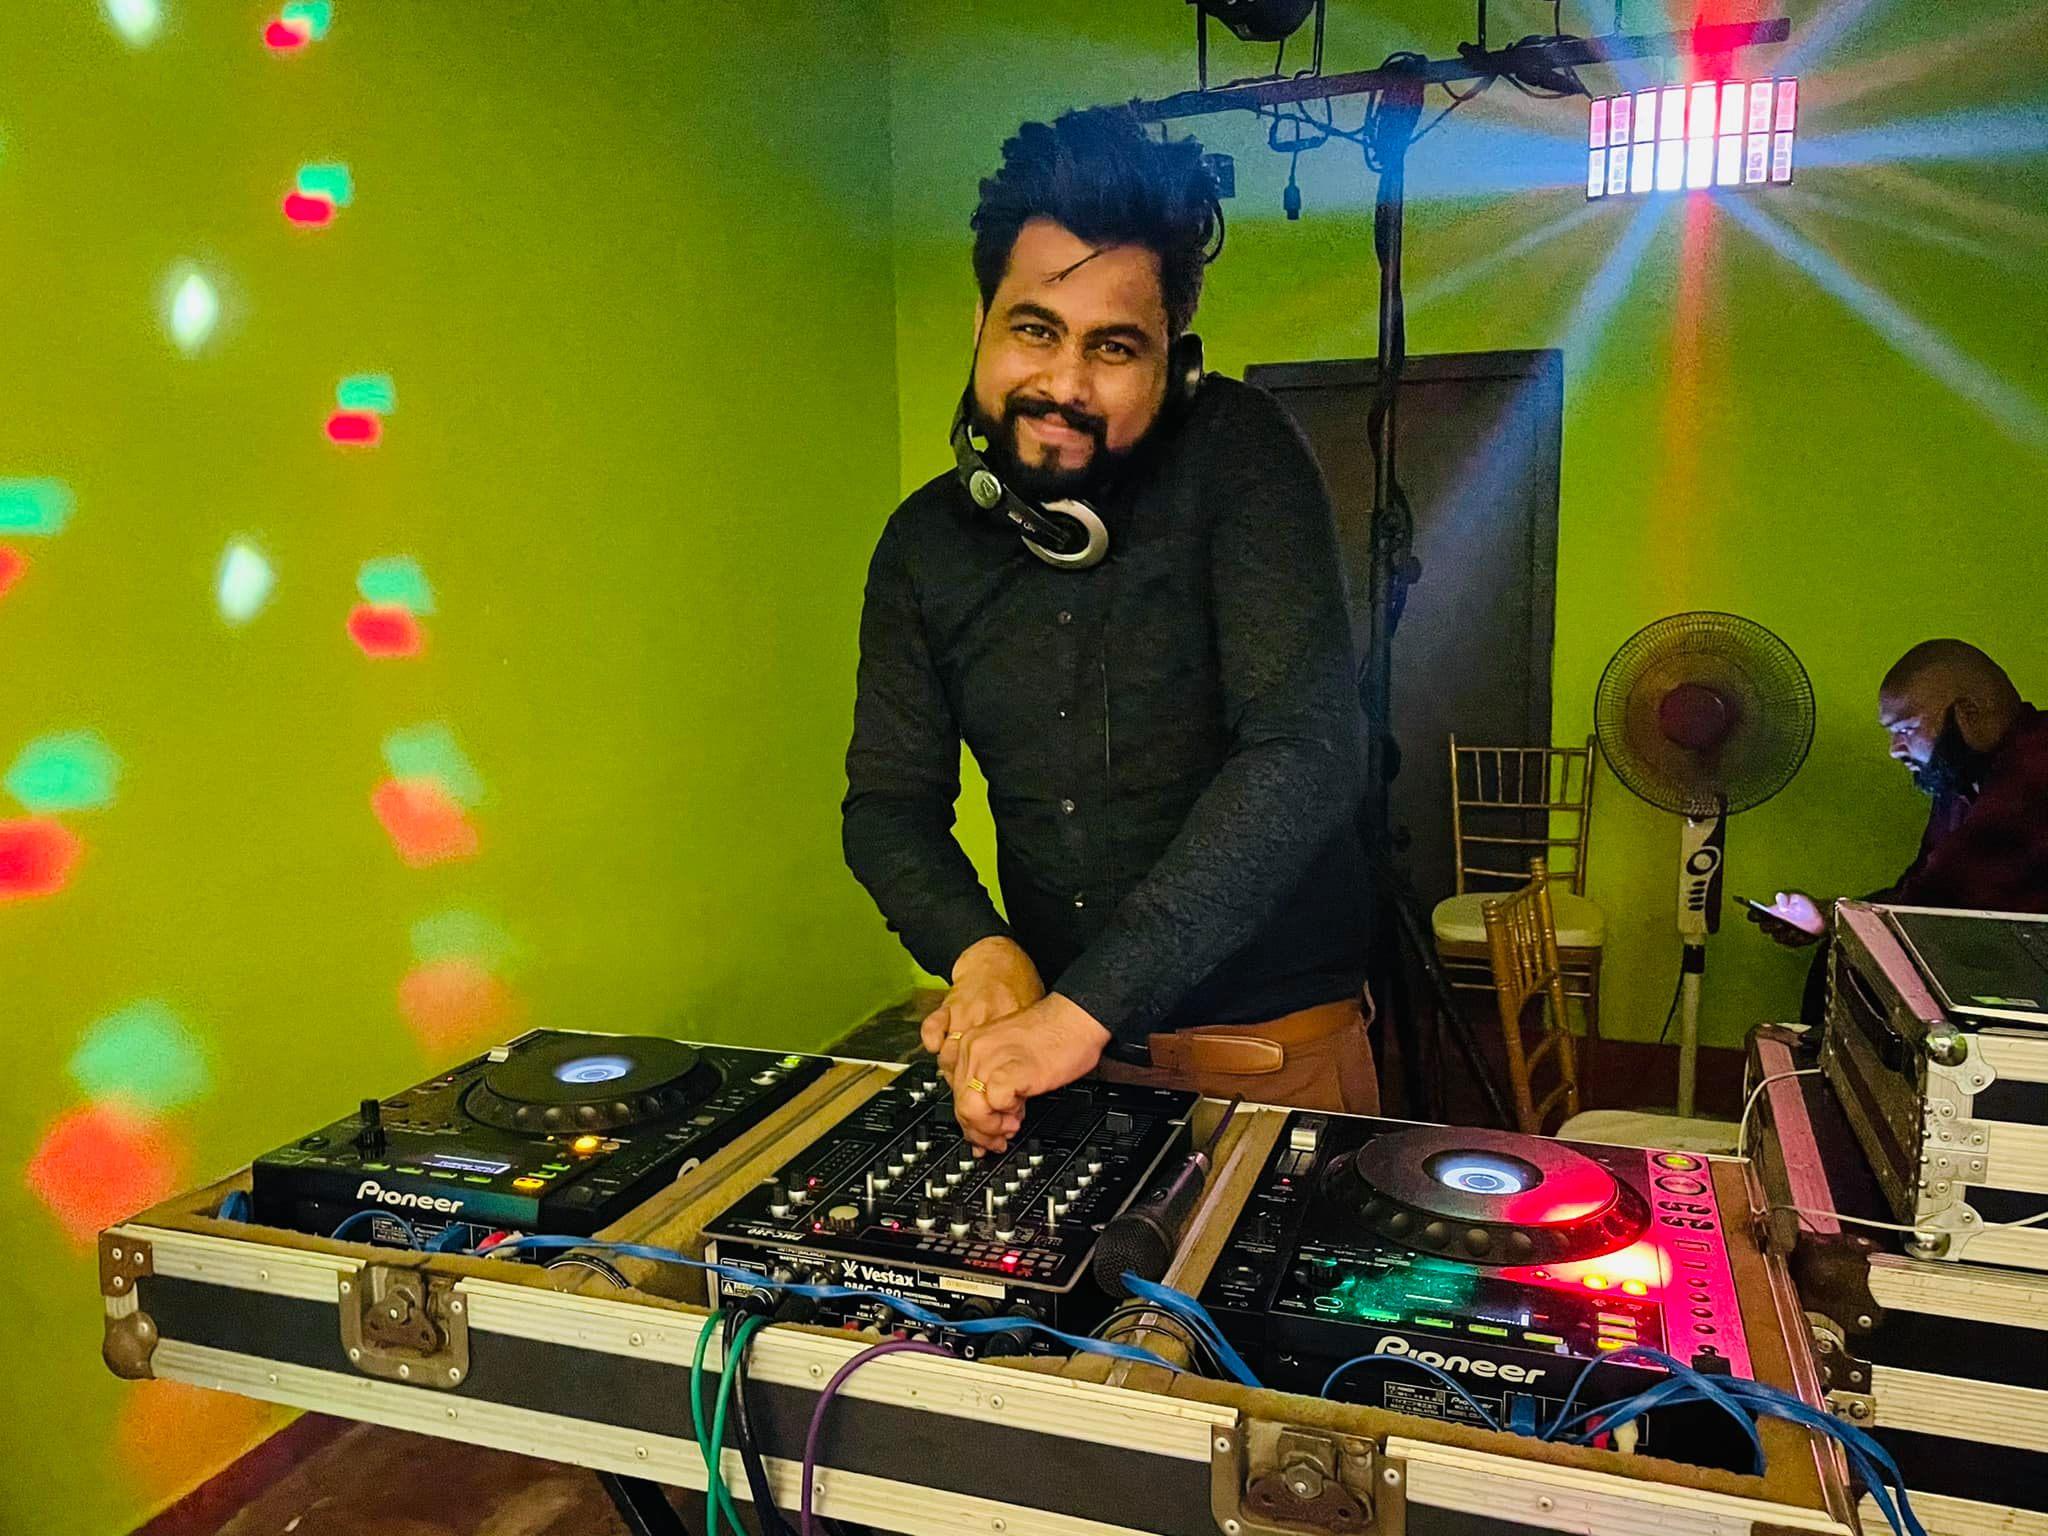 create a custom dj set or mix for you